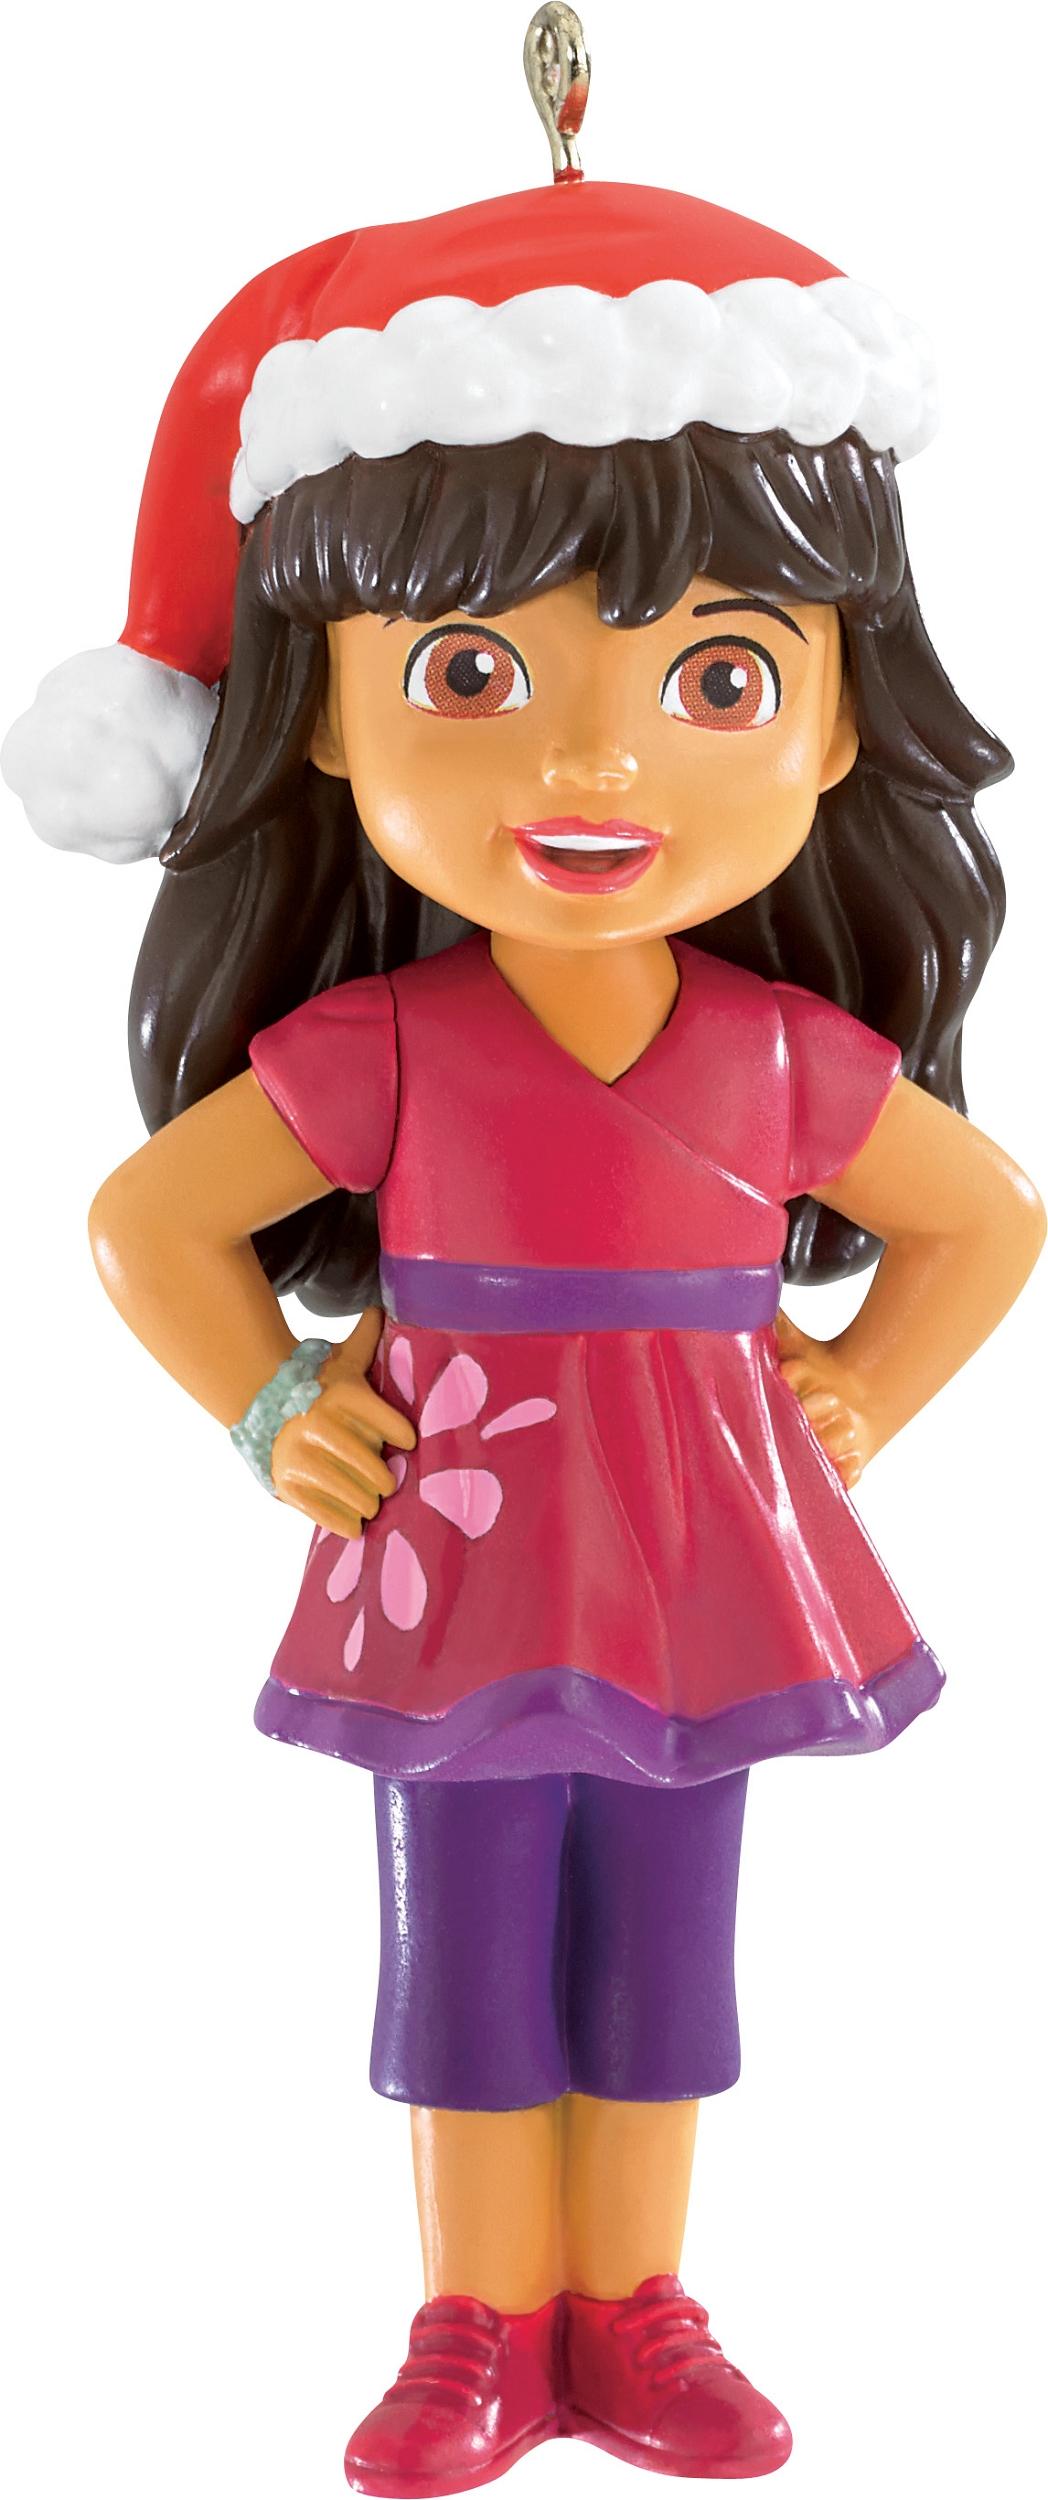 2015 Dora And Friends Christmas Ornament Carlton